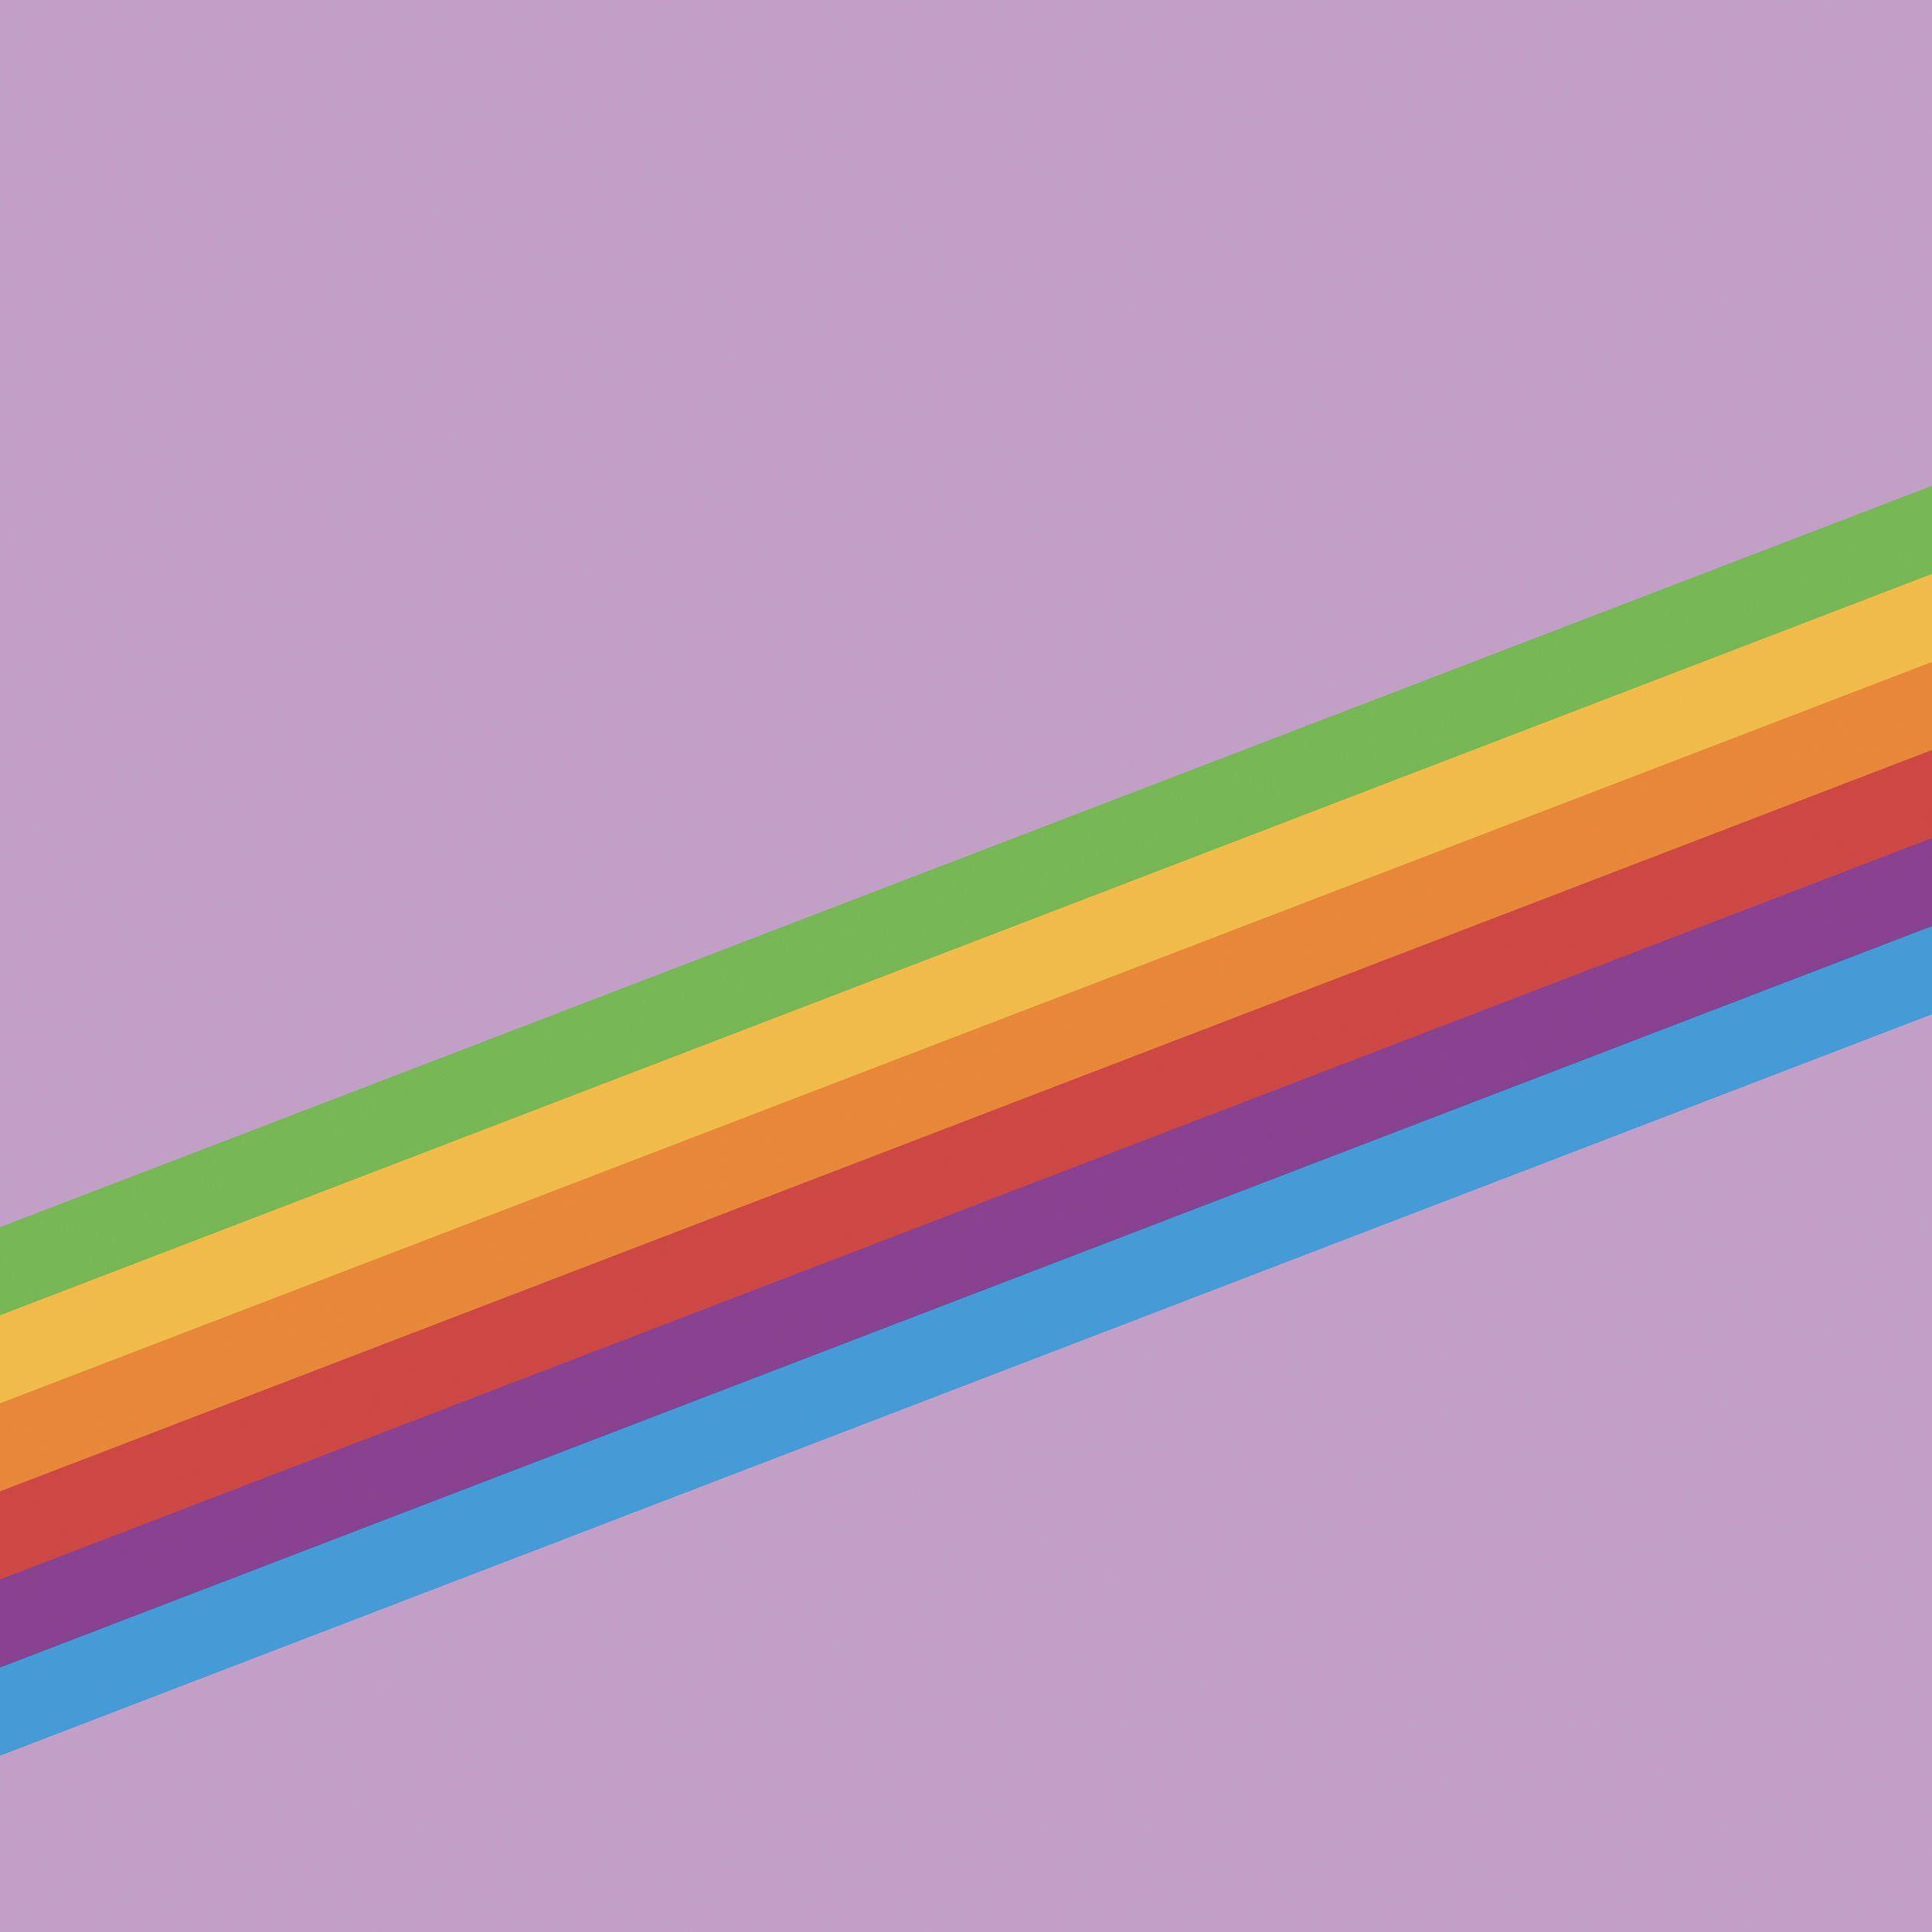 Rainbow iPad Wallpapers   Top Free Rainbow iPad Backgrounds ...